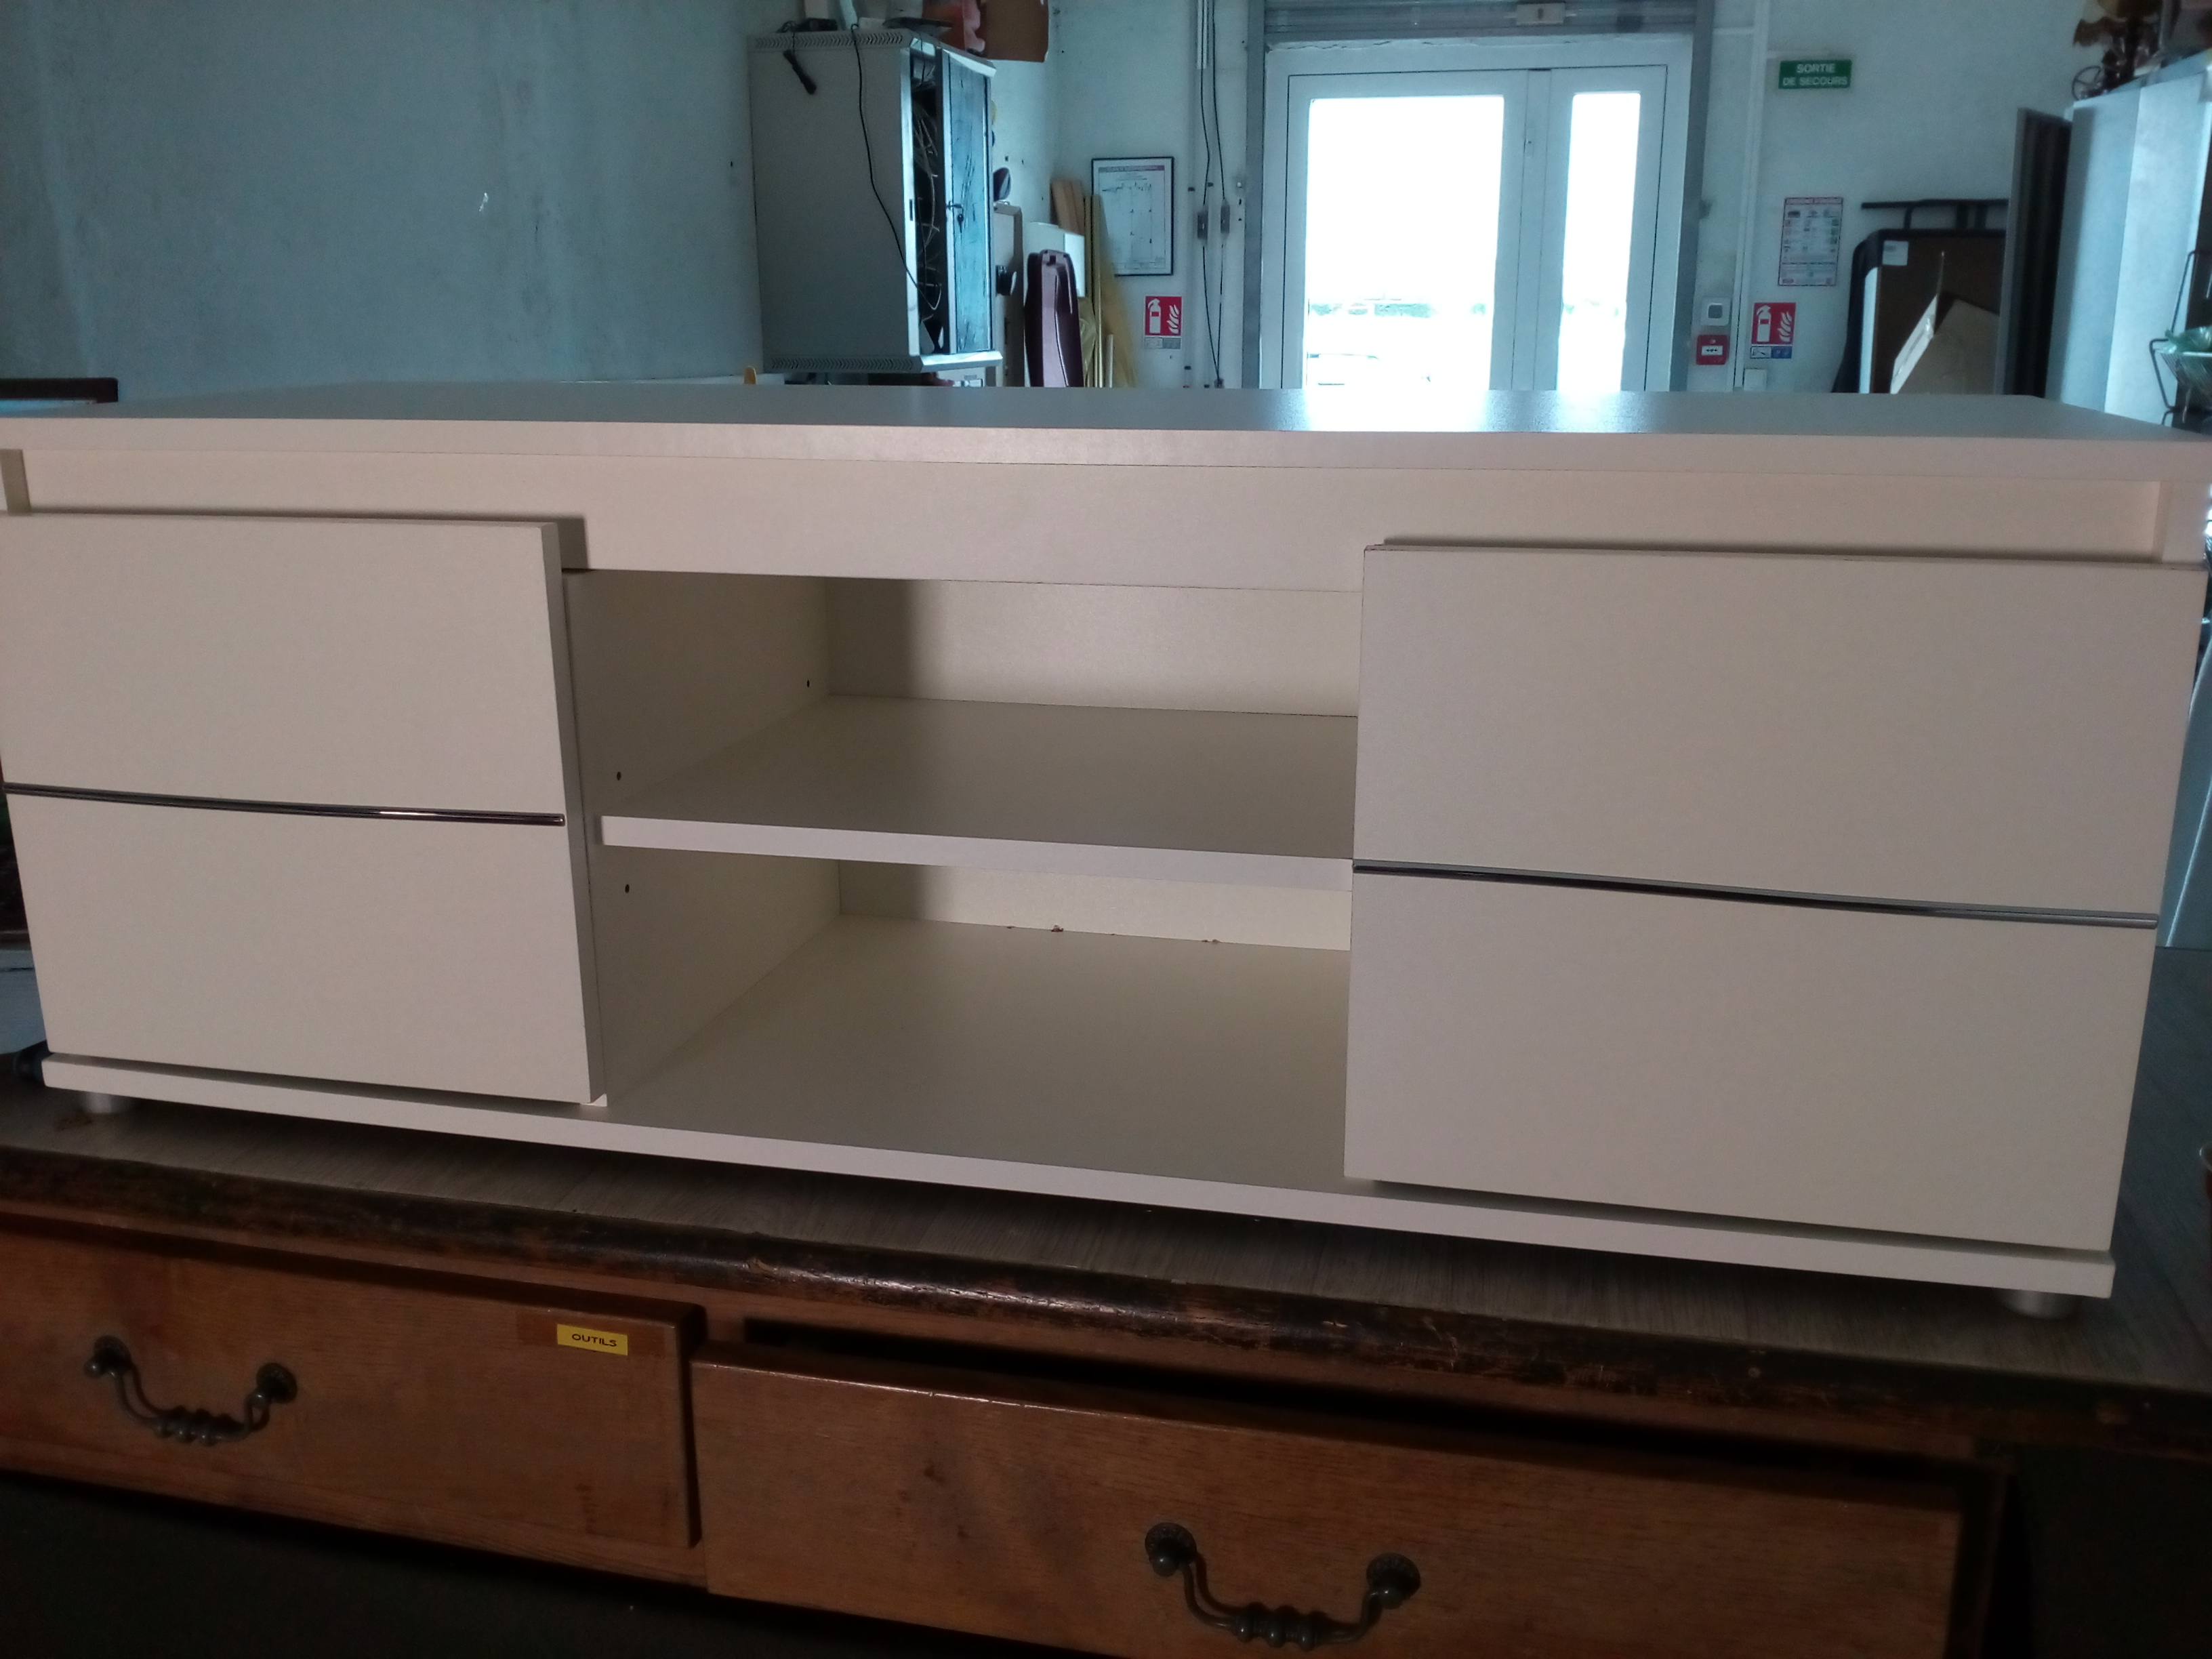 meuble tv moderne blanc neuf valeur internet 79 occasion la cabane du troc. Black Bedroom Furniture Sets. Home Design Ideas